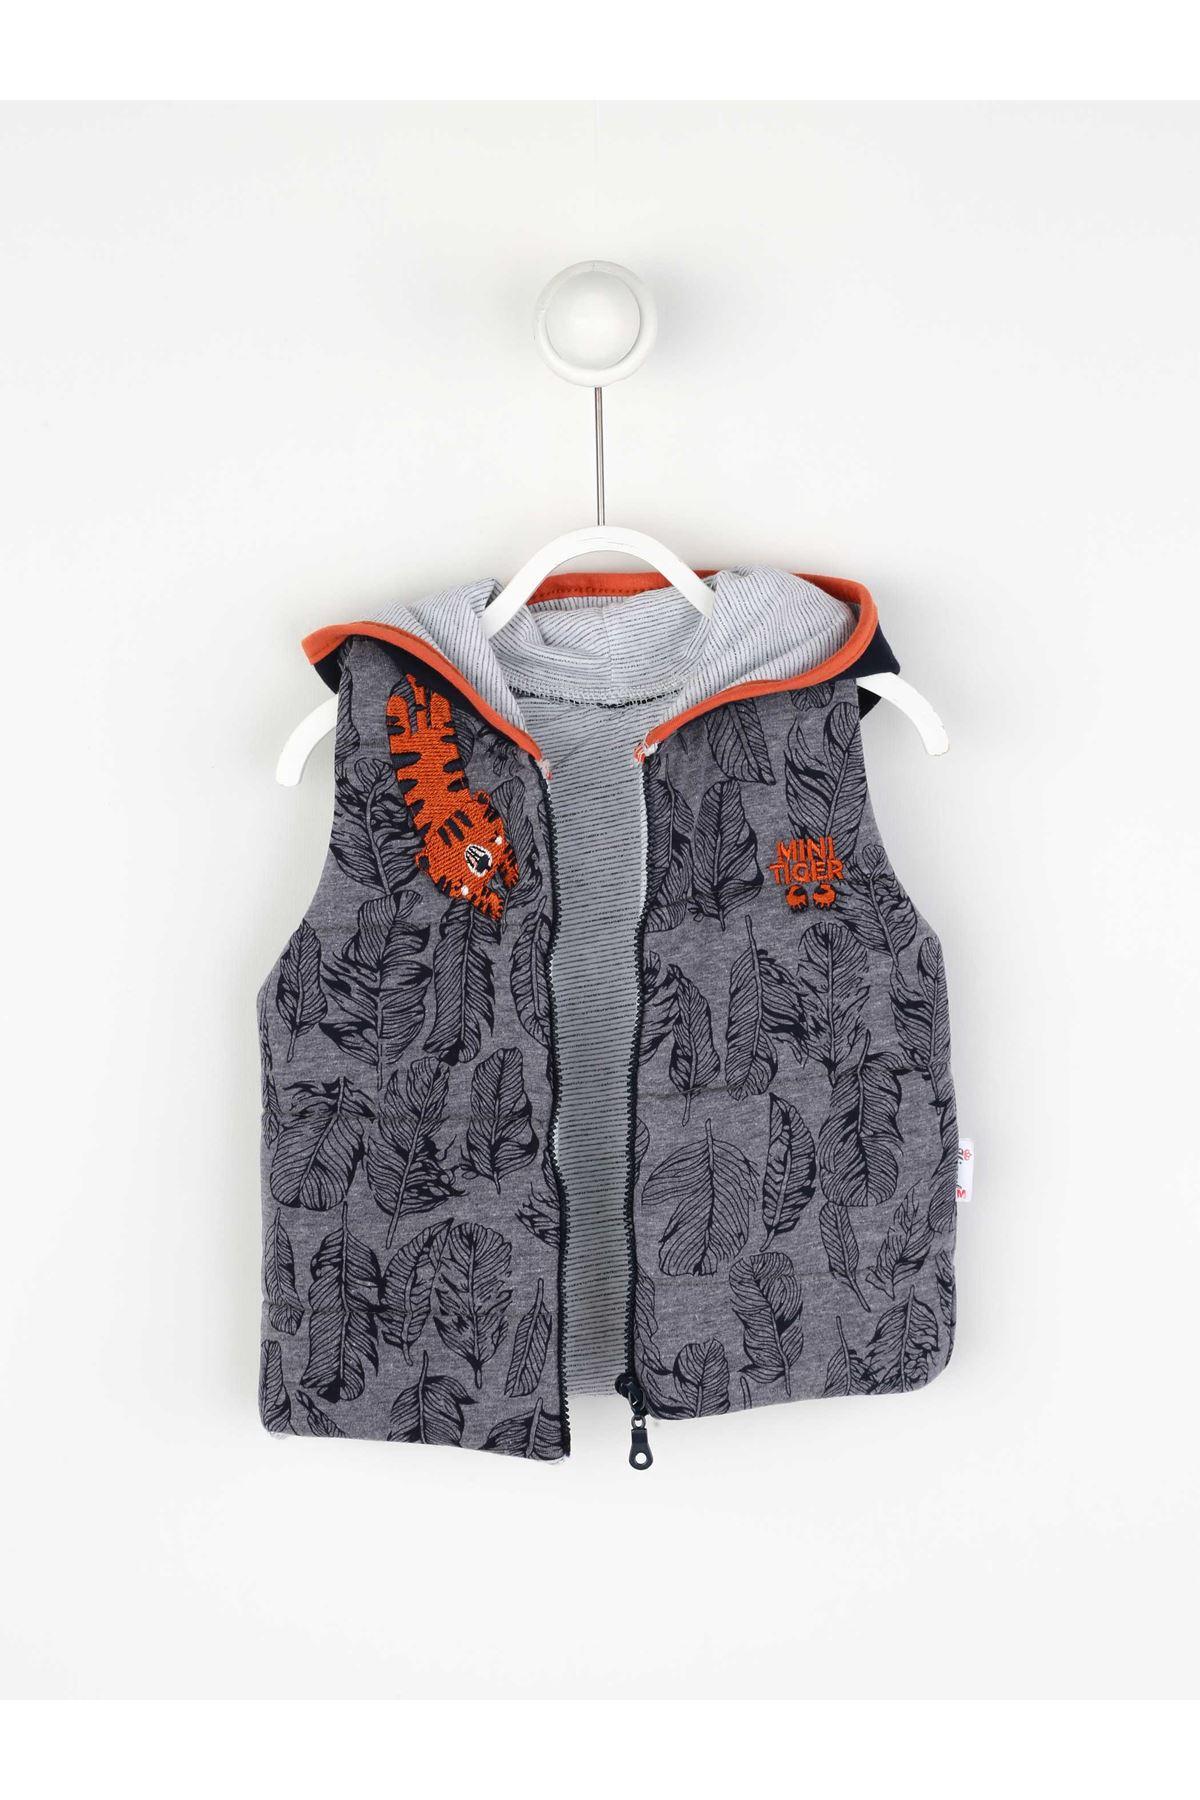 Navy blue Seasonal Male Baby Vest Suit